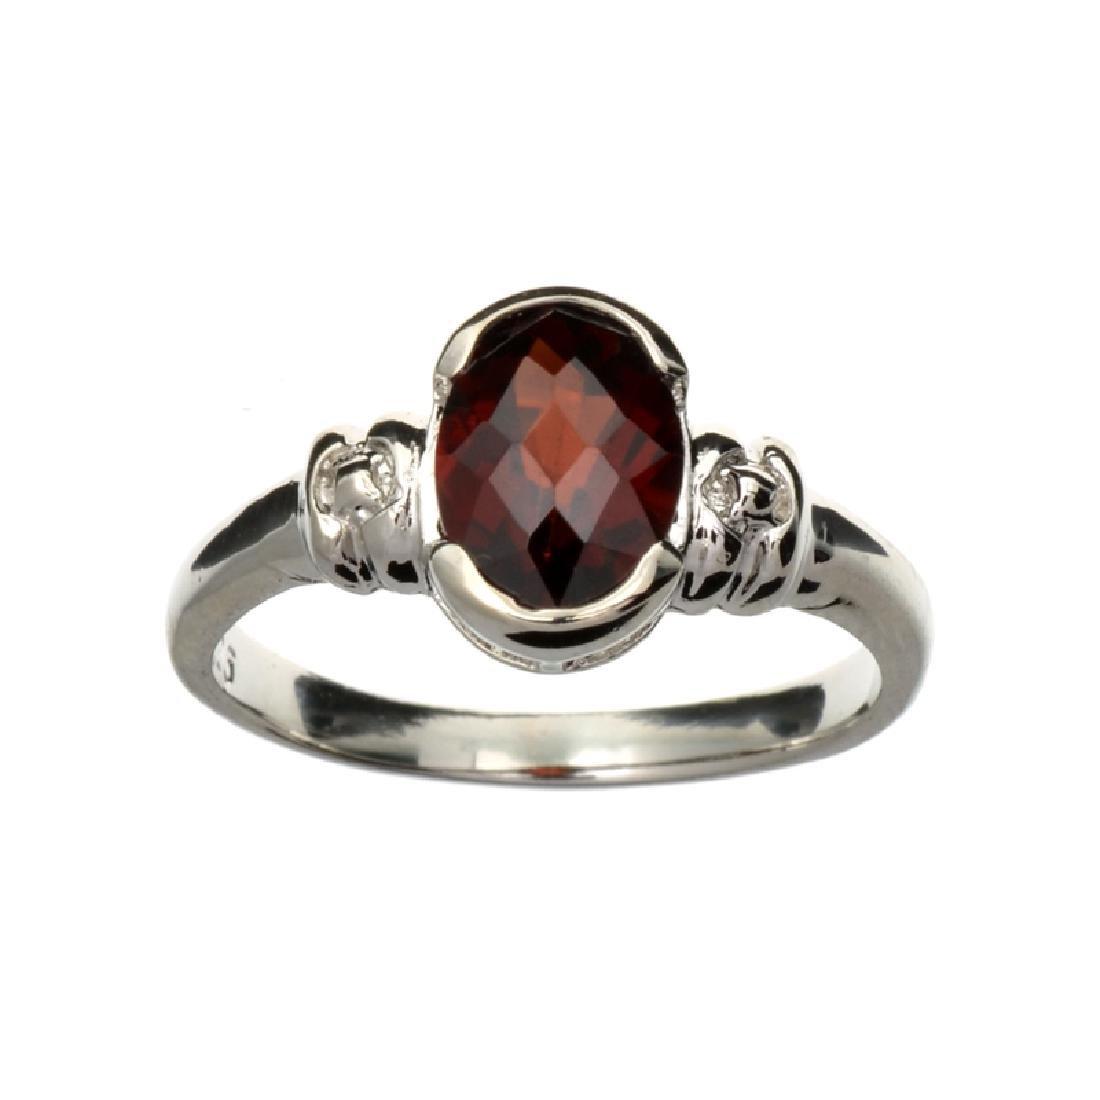 APP: 1k Fine Jewelry 1.75CT Oval Cut Almandite Garnet